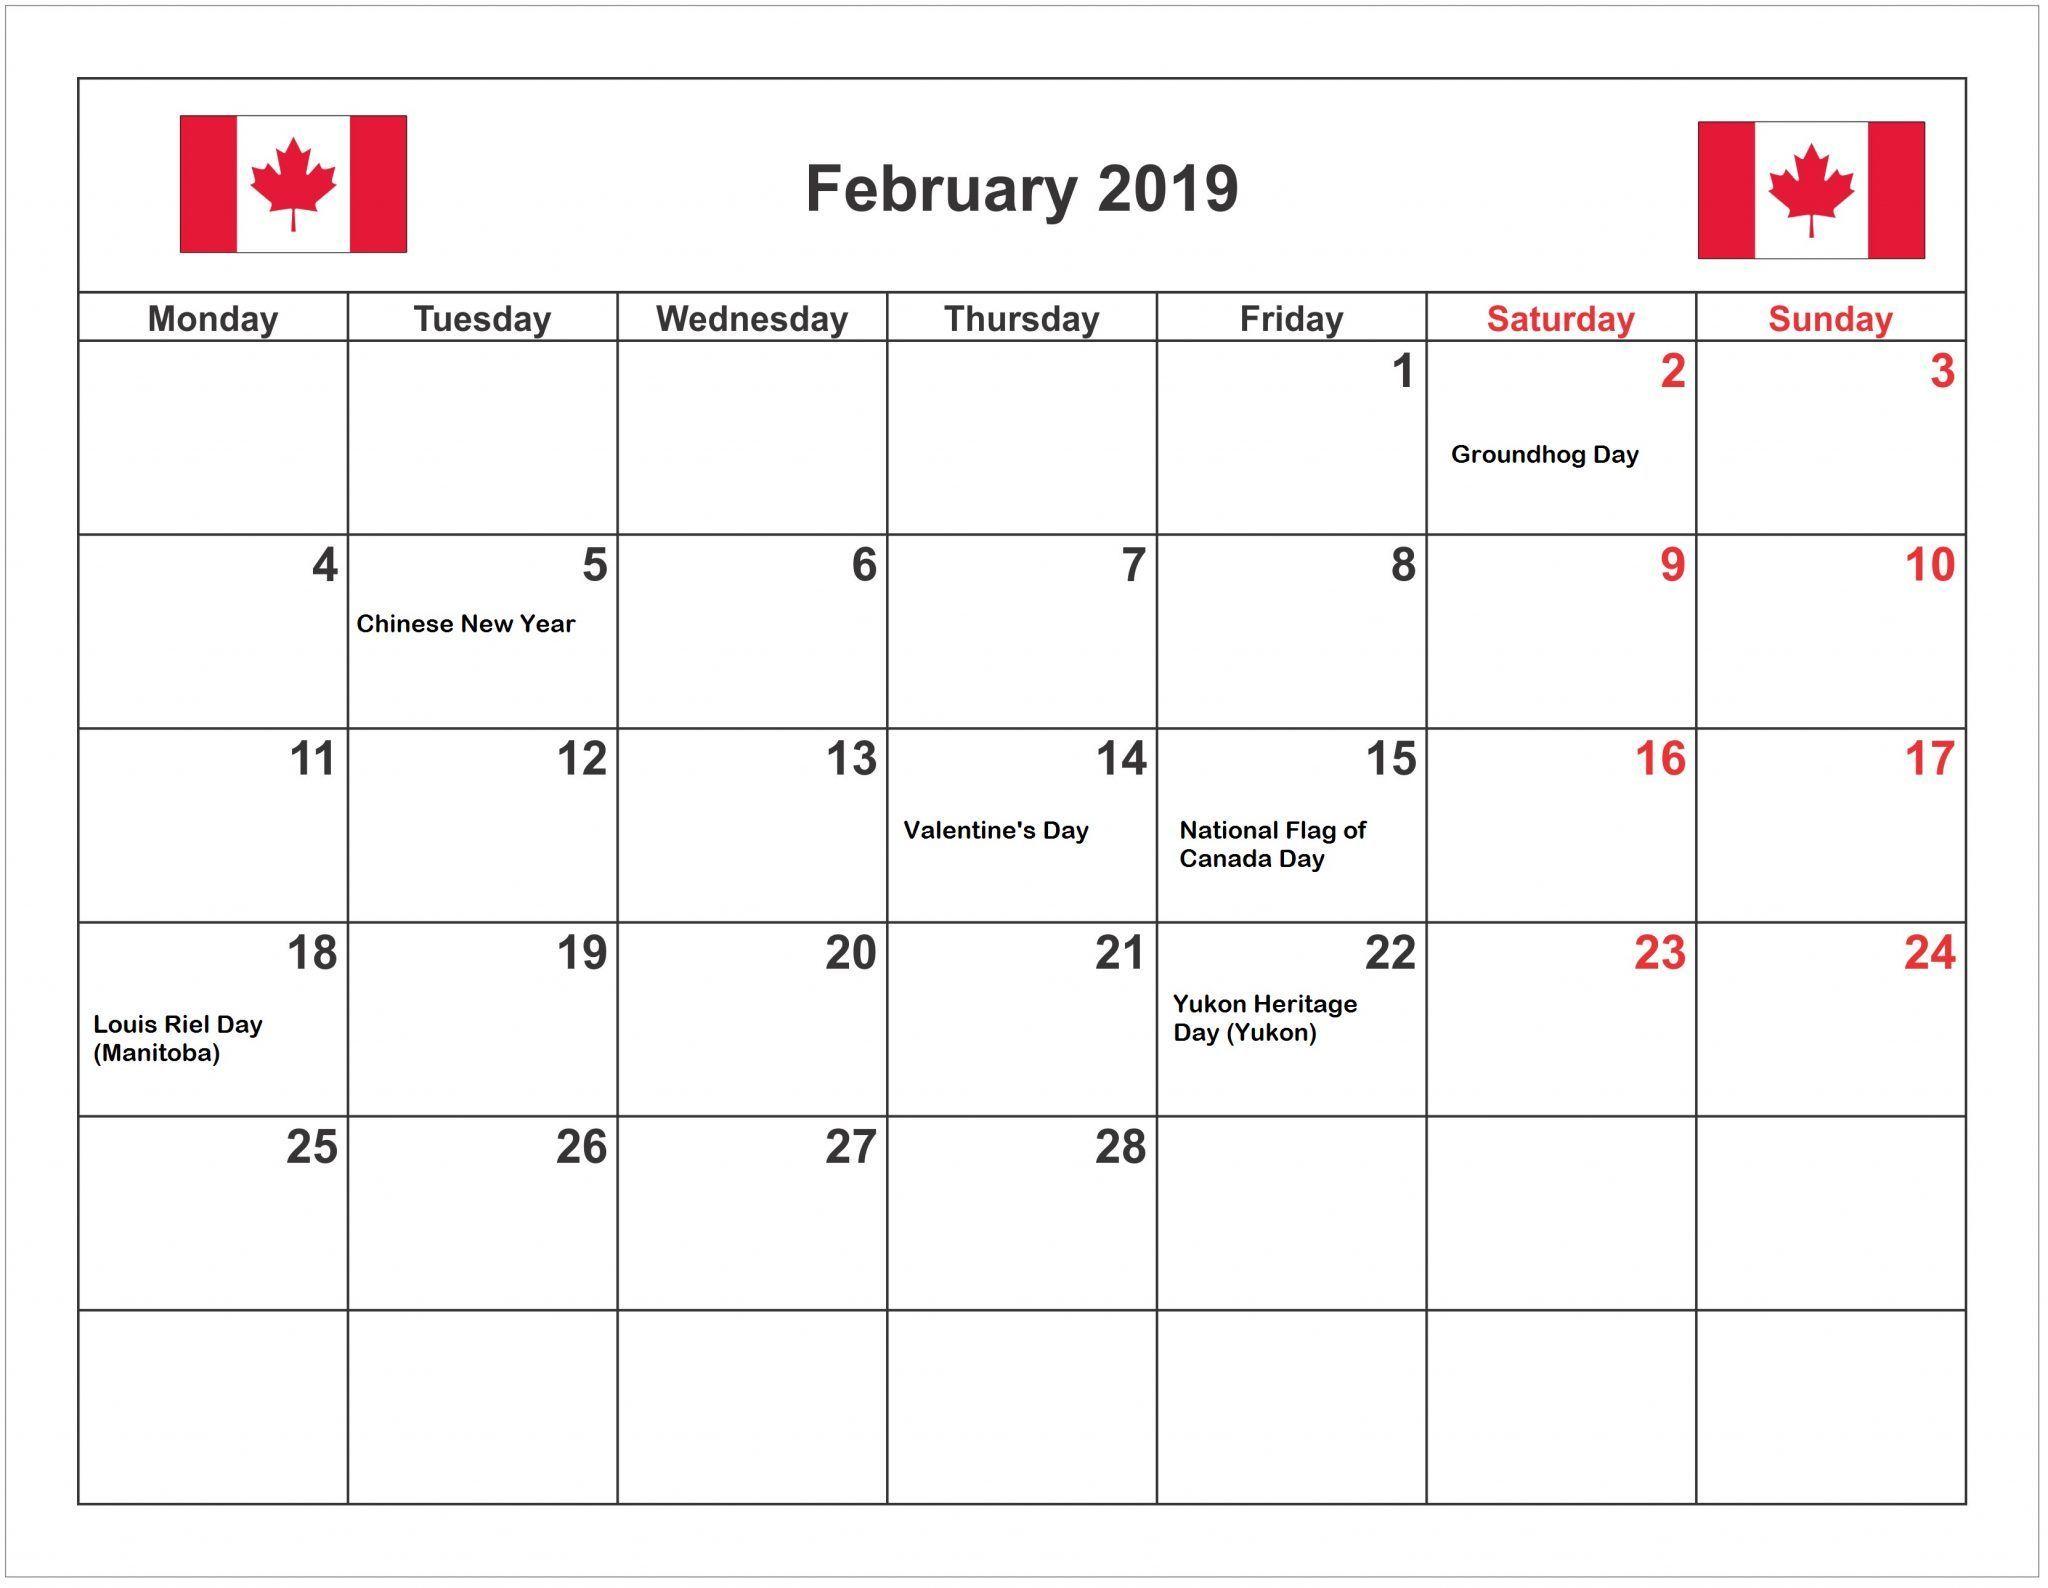 February 2019 Calendar Canada With Public Holidays